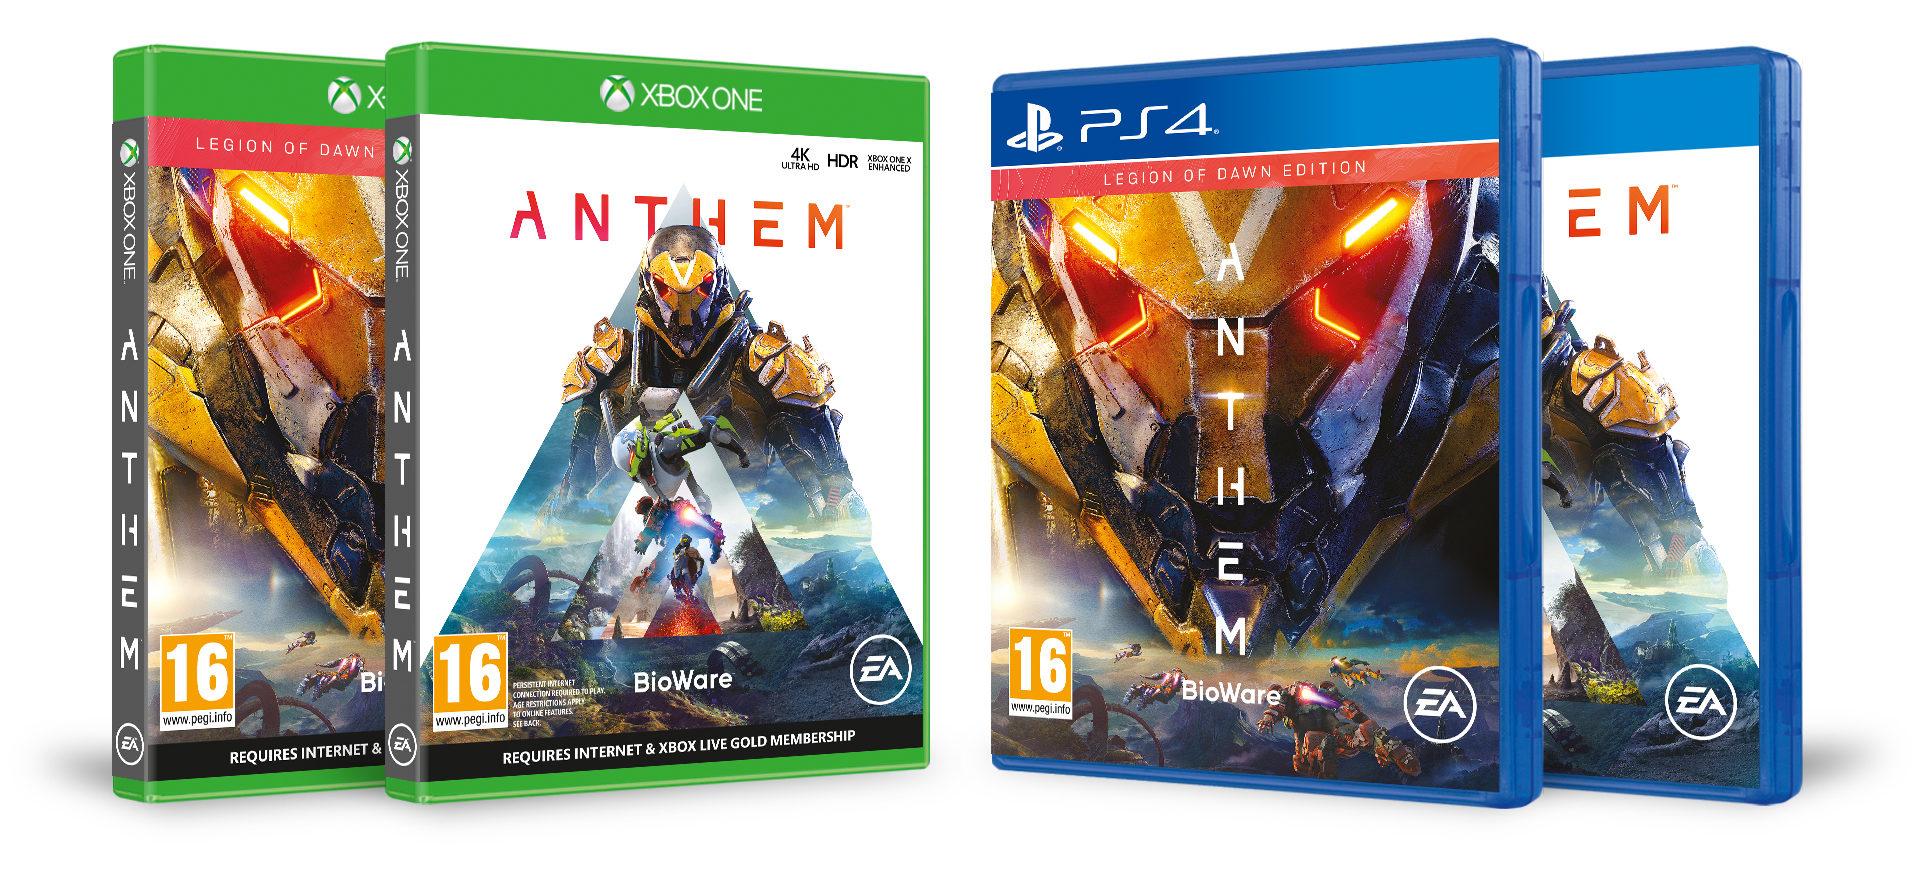 Anthem_Packshot_EA_Video_Game